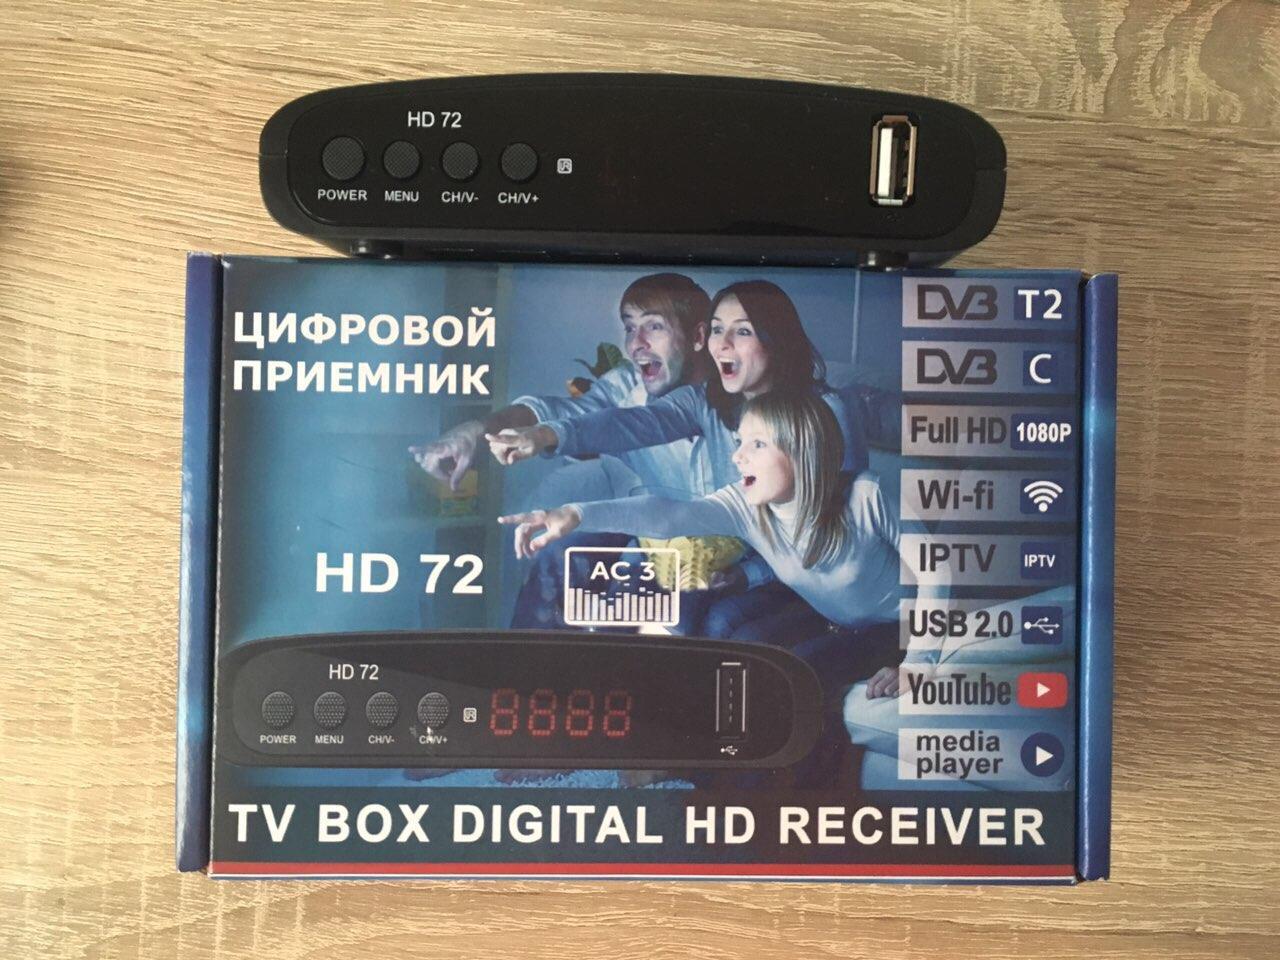 TV тюнер Т2 приемник для цифрового ТВ приставка, выход HDMI, HD-72 receiver tv box